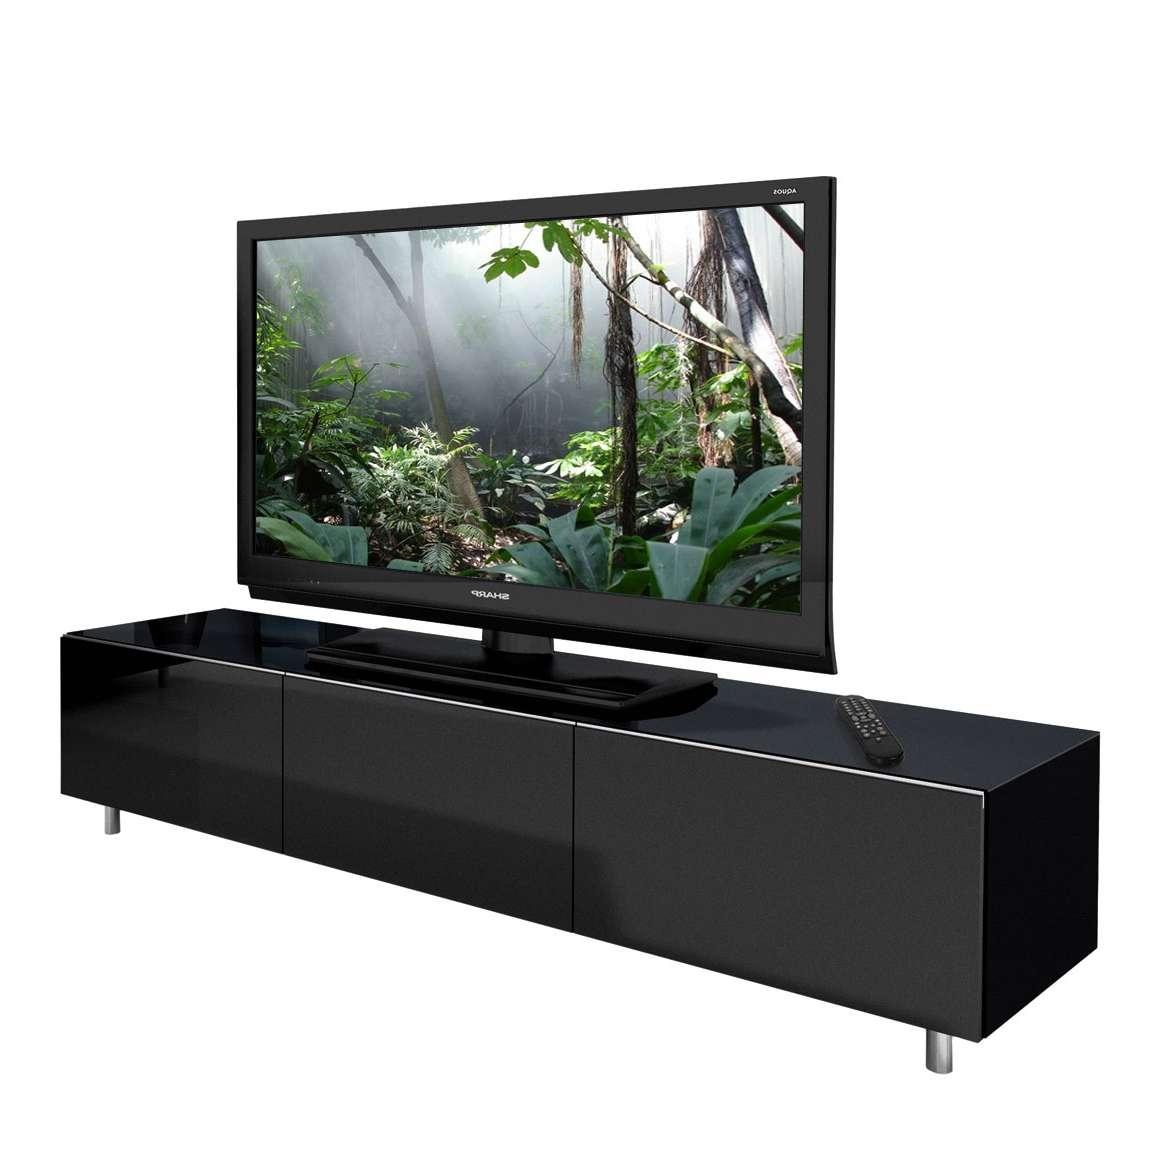 Spectral Just Racks Jrl1650S Gloss Black Tv Cabinet – Just Racks Regarding Black Gloss Tv Stands (View 13 of 15)